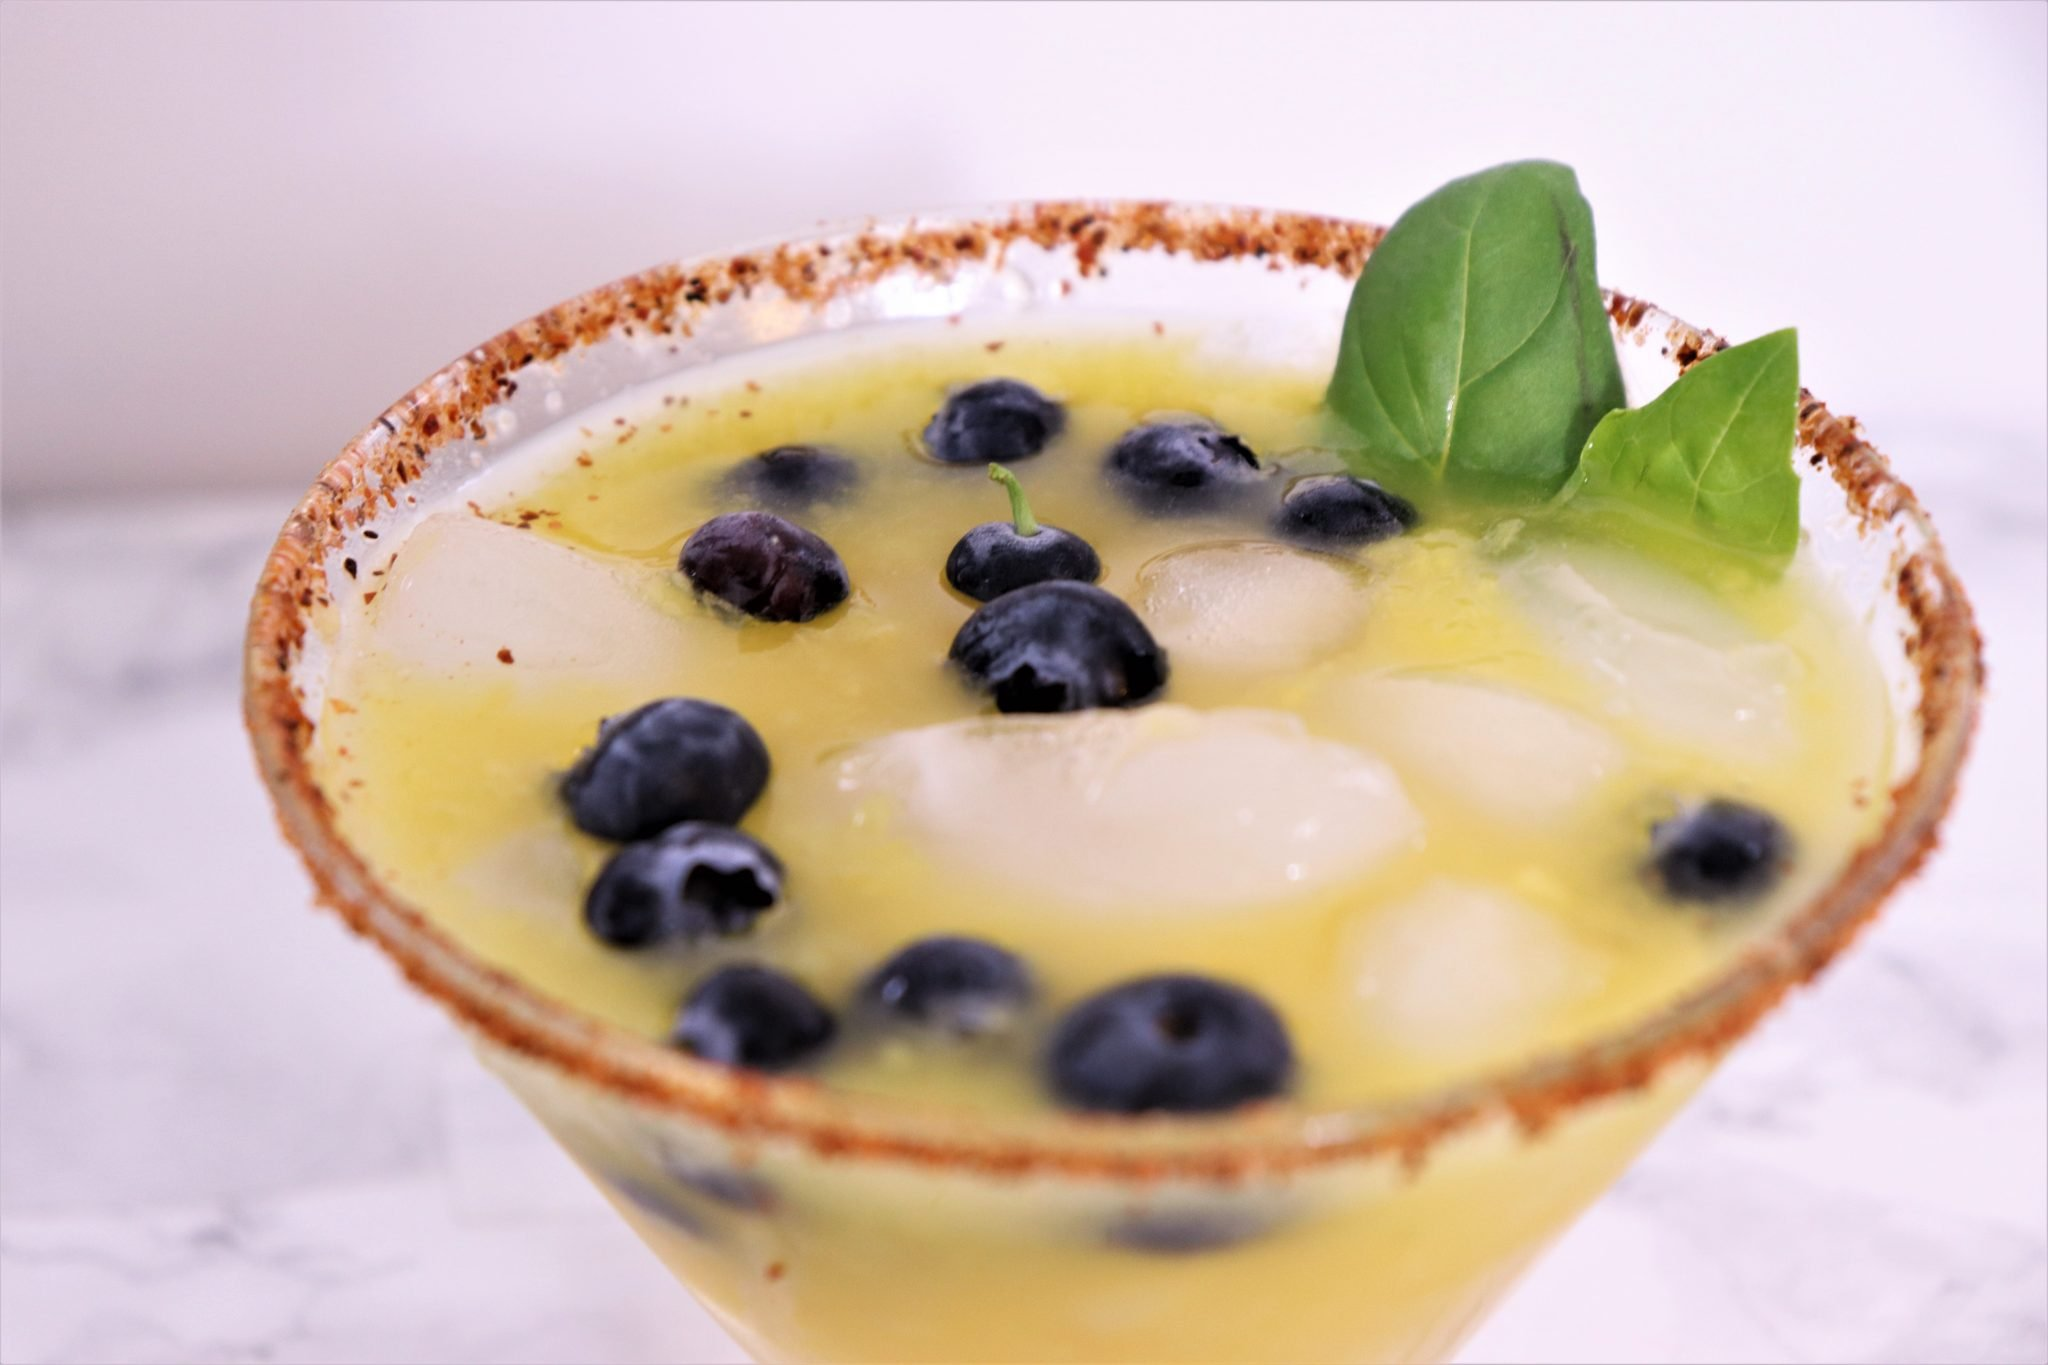 Maelstrom margarita recipe - Disney in your Day